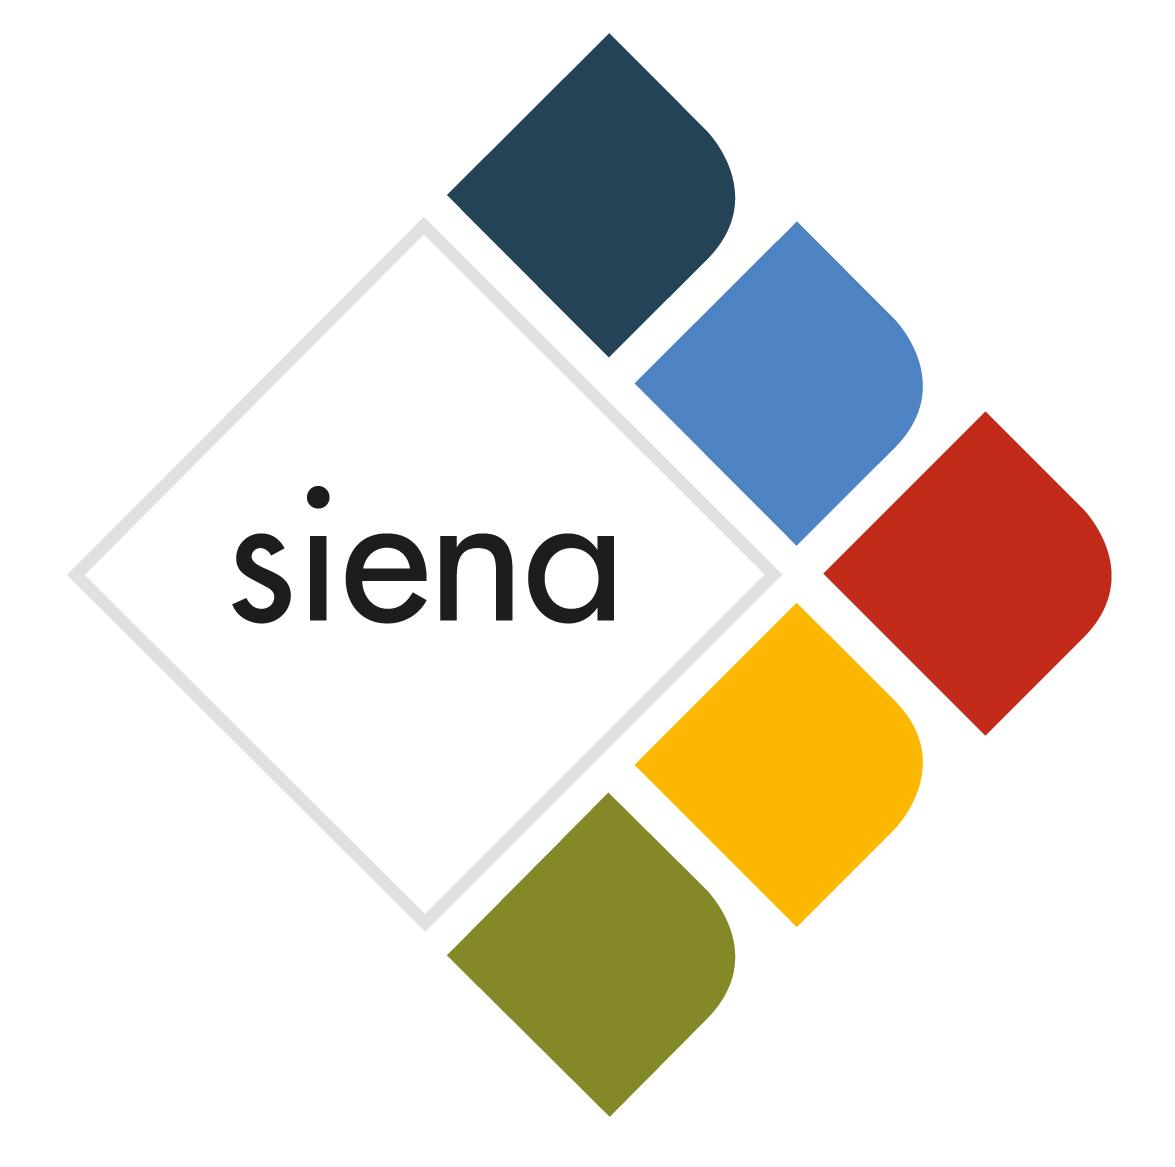 siena_final_logo_NOTEXT_DIGITAL_r1-01.png